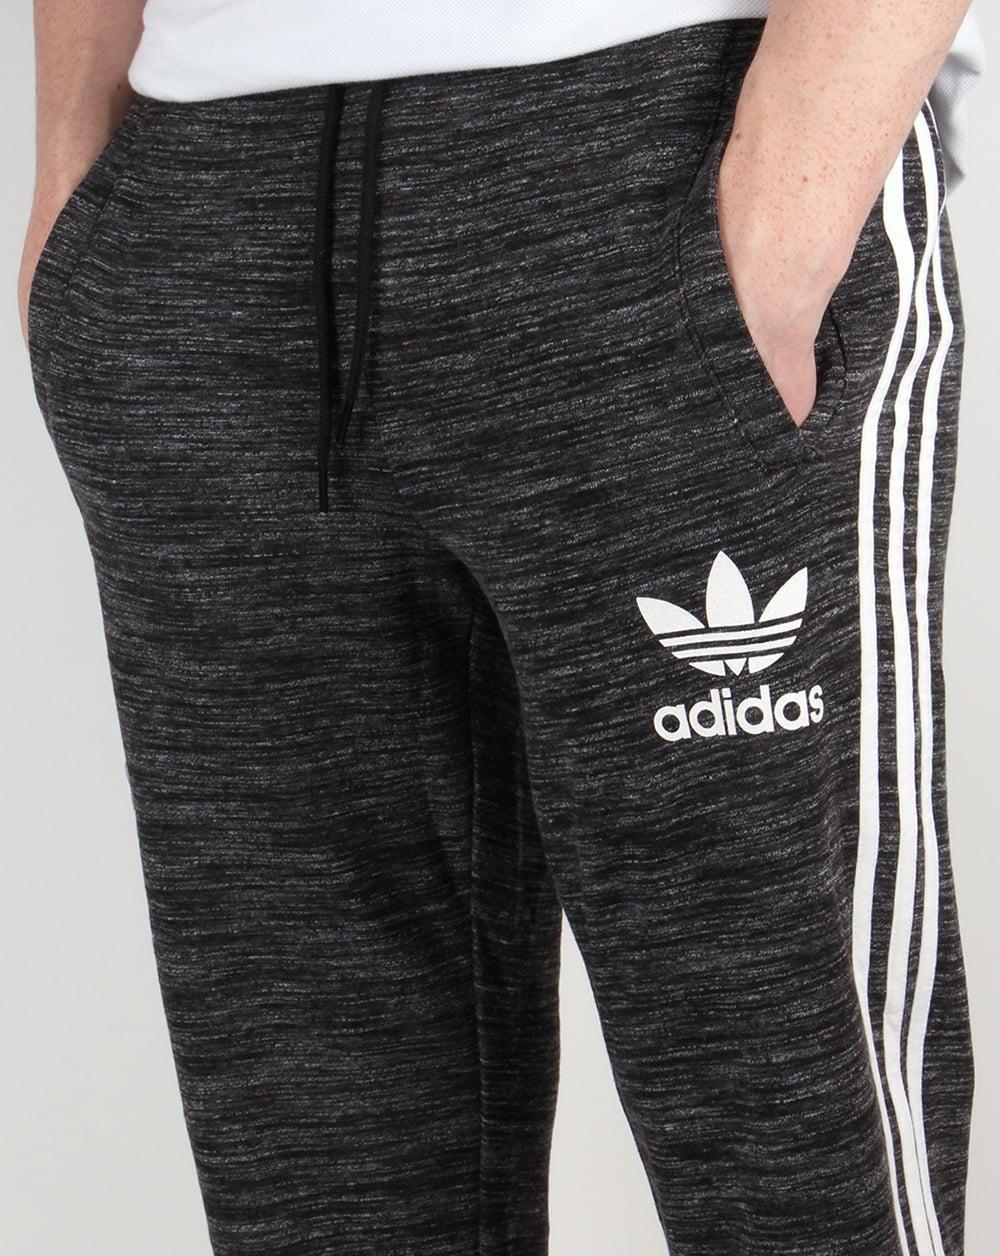 Adidas Originals California FT Track Pants Black